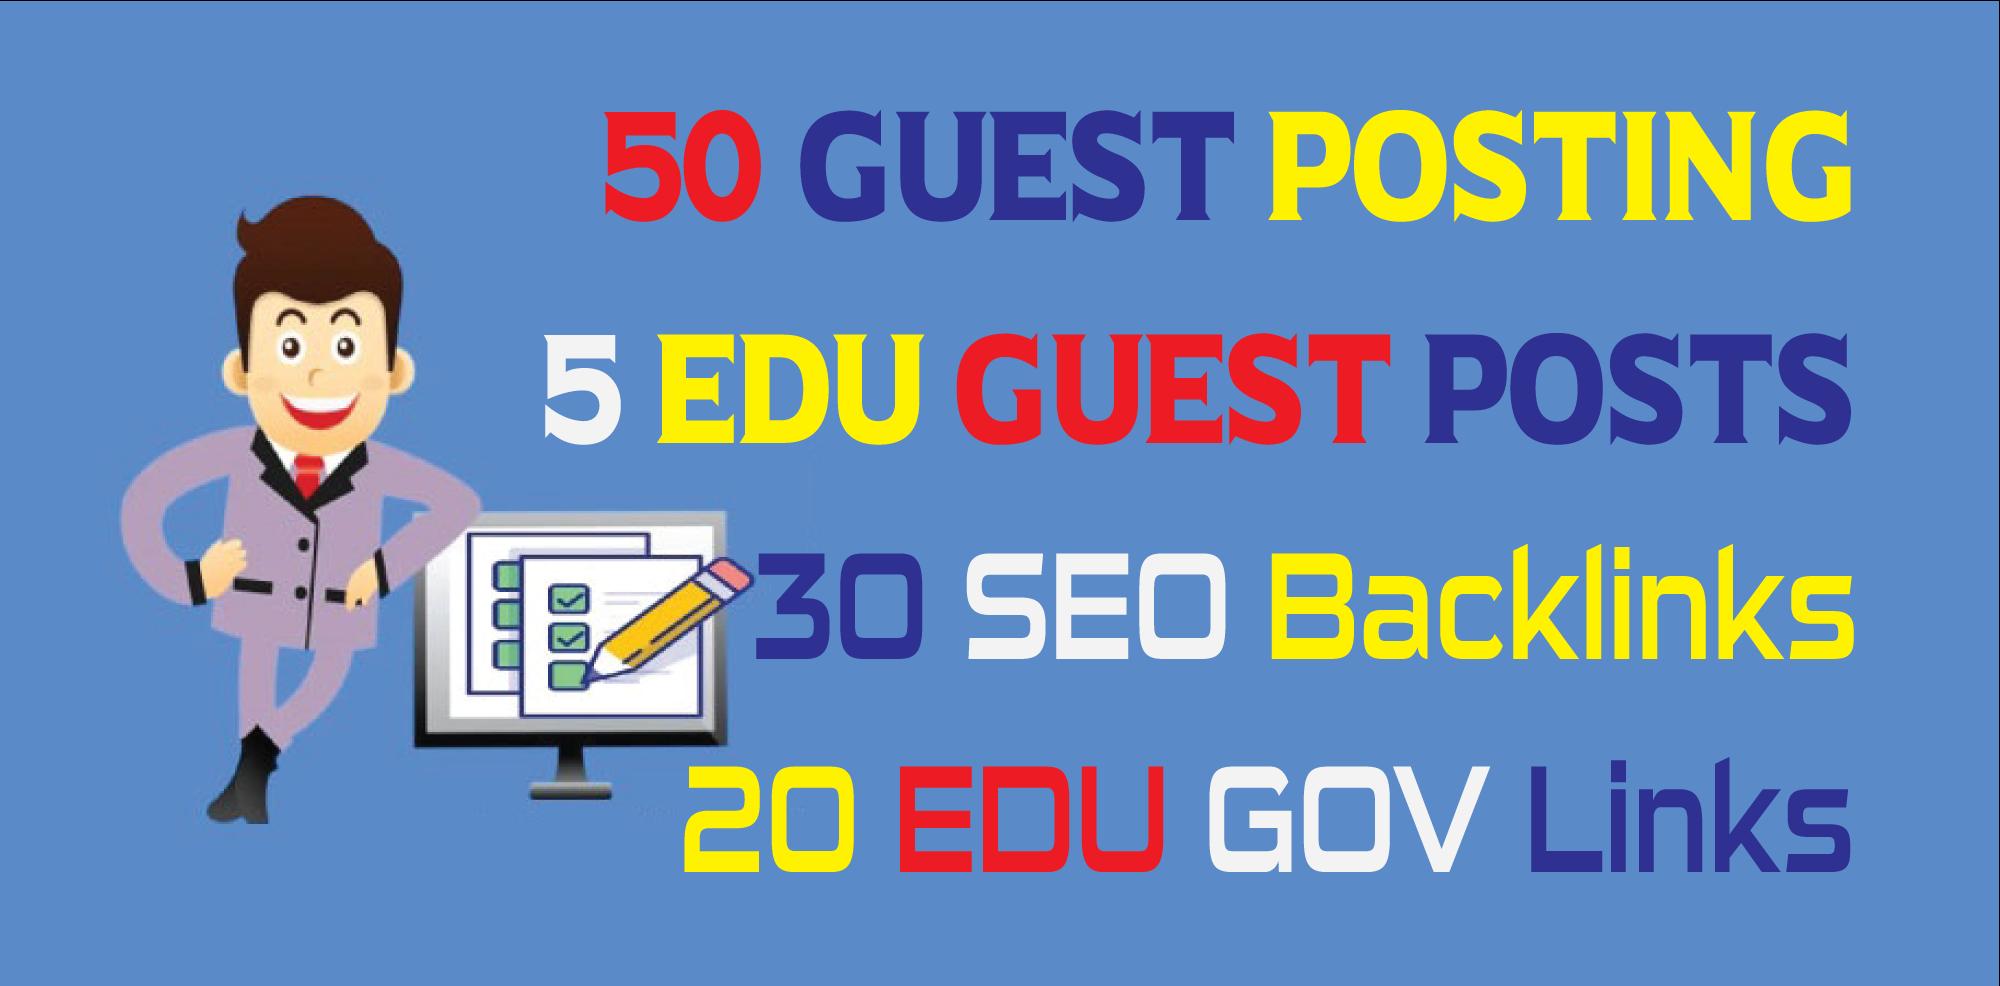 50 Guest Posting,  5 EDU Guest Posts,  20 EDU GOV Links,  90DA 30 SEO Backlinks